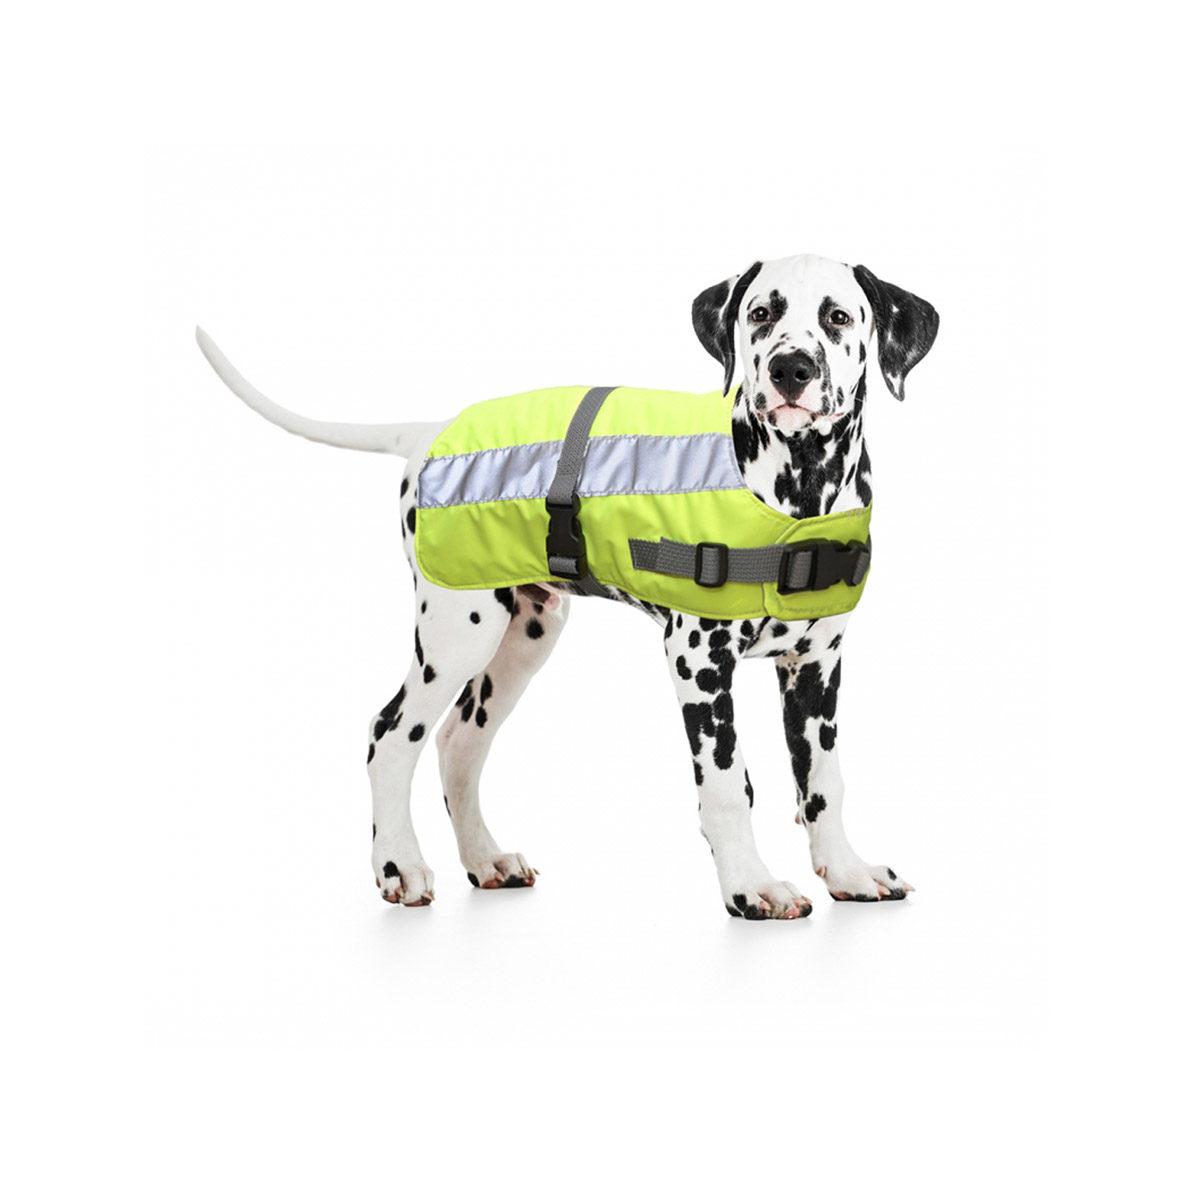 Duvo+ Flectalon Hi Vis Honden Jack Ruglengte 50 cm Geel - in Reflectie & Verlichting